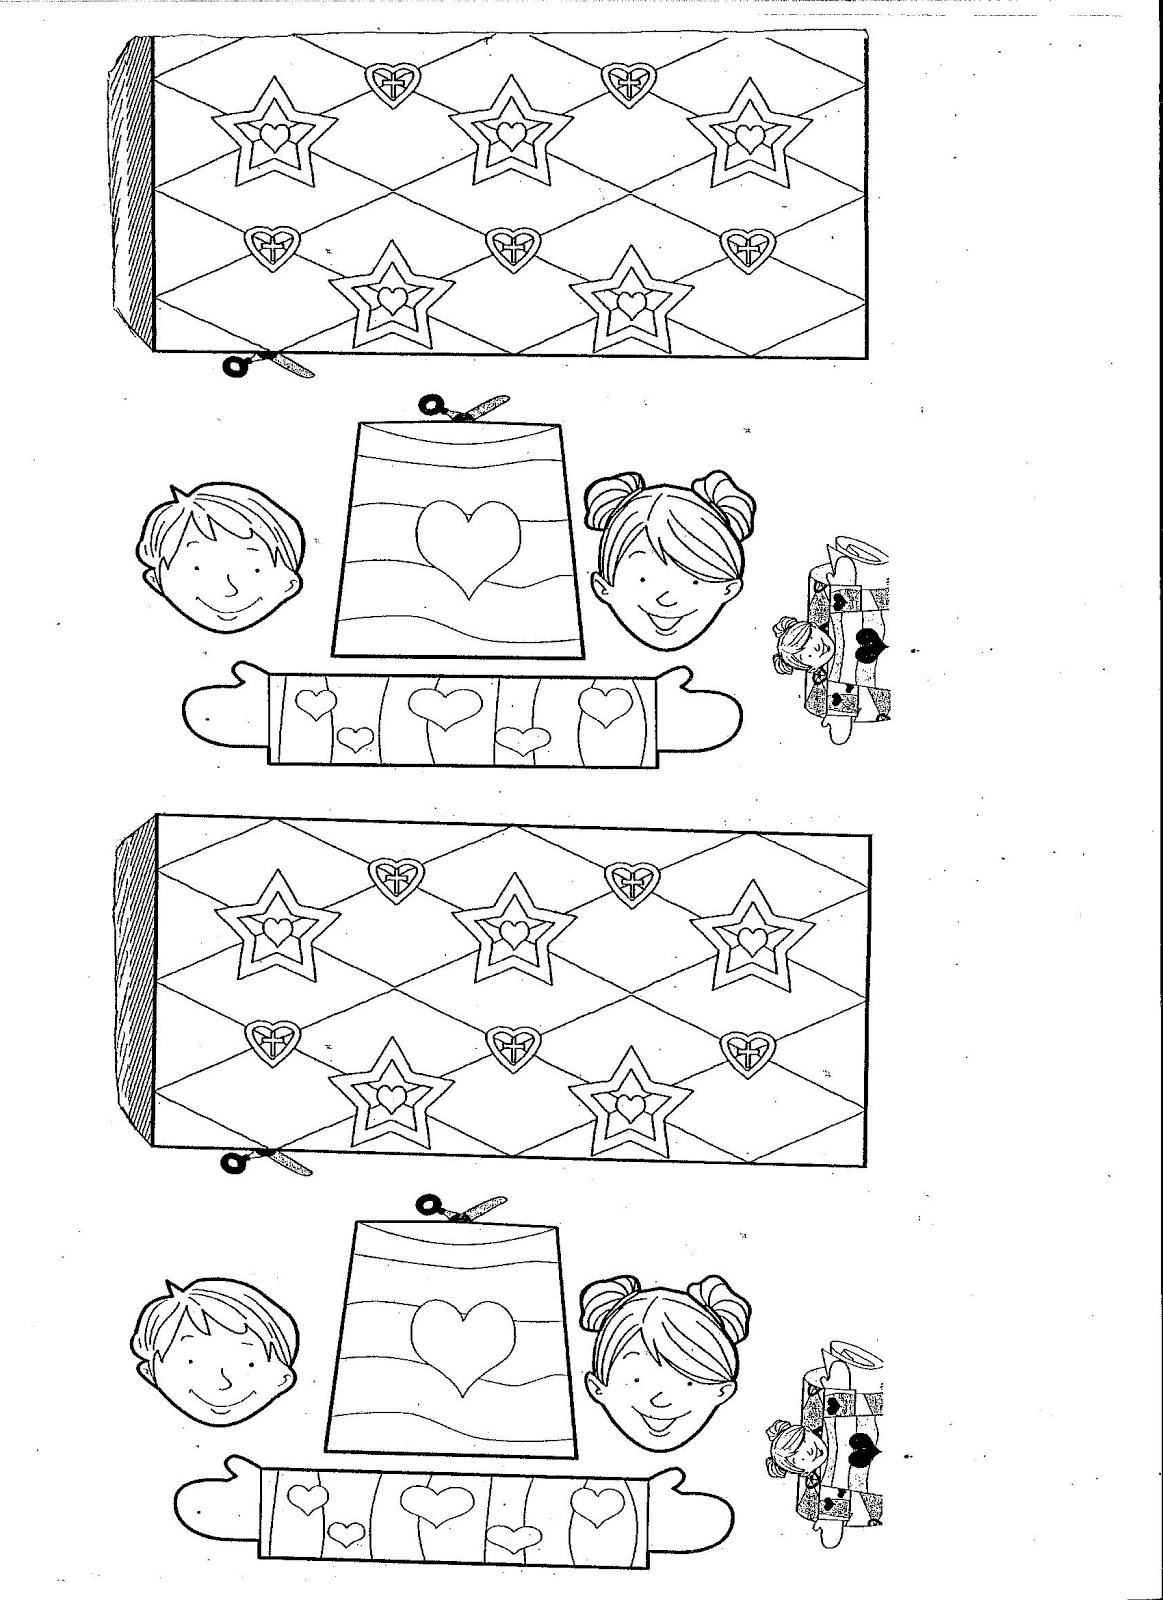 Utiles Escolares Dibujos Pictures to Pin on Pinterest - TattoosKid